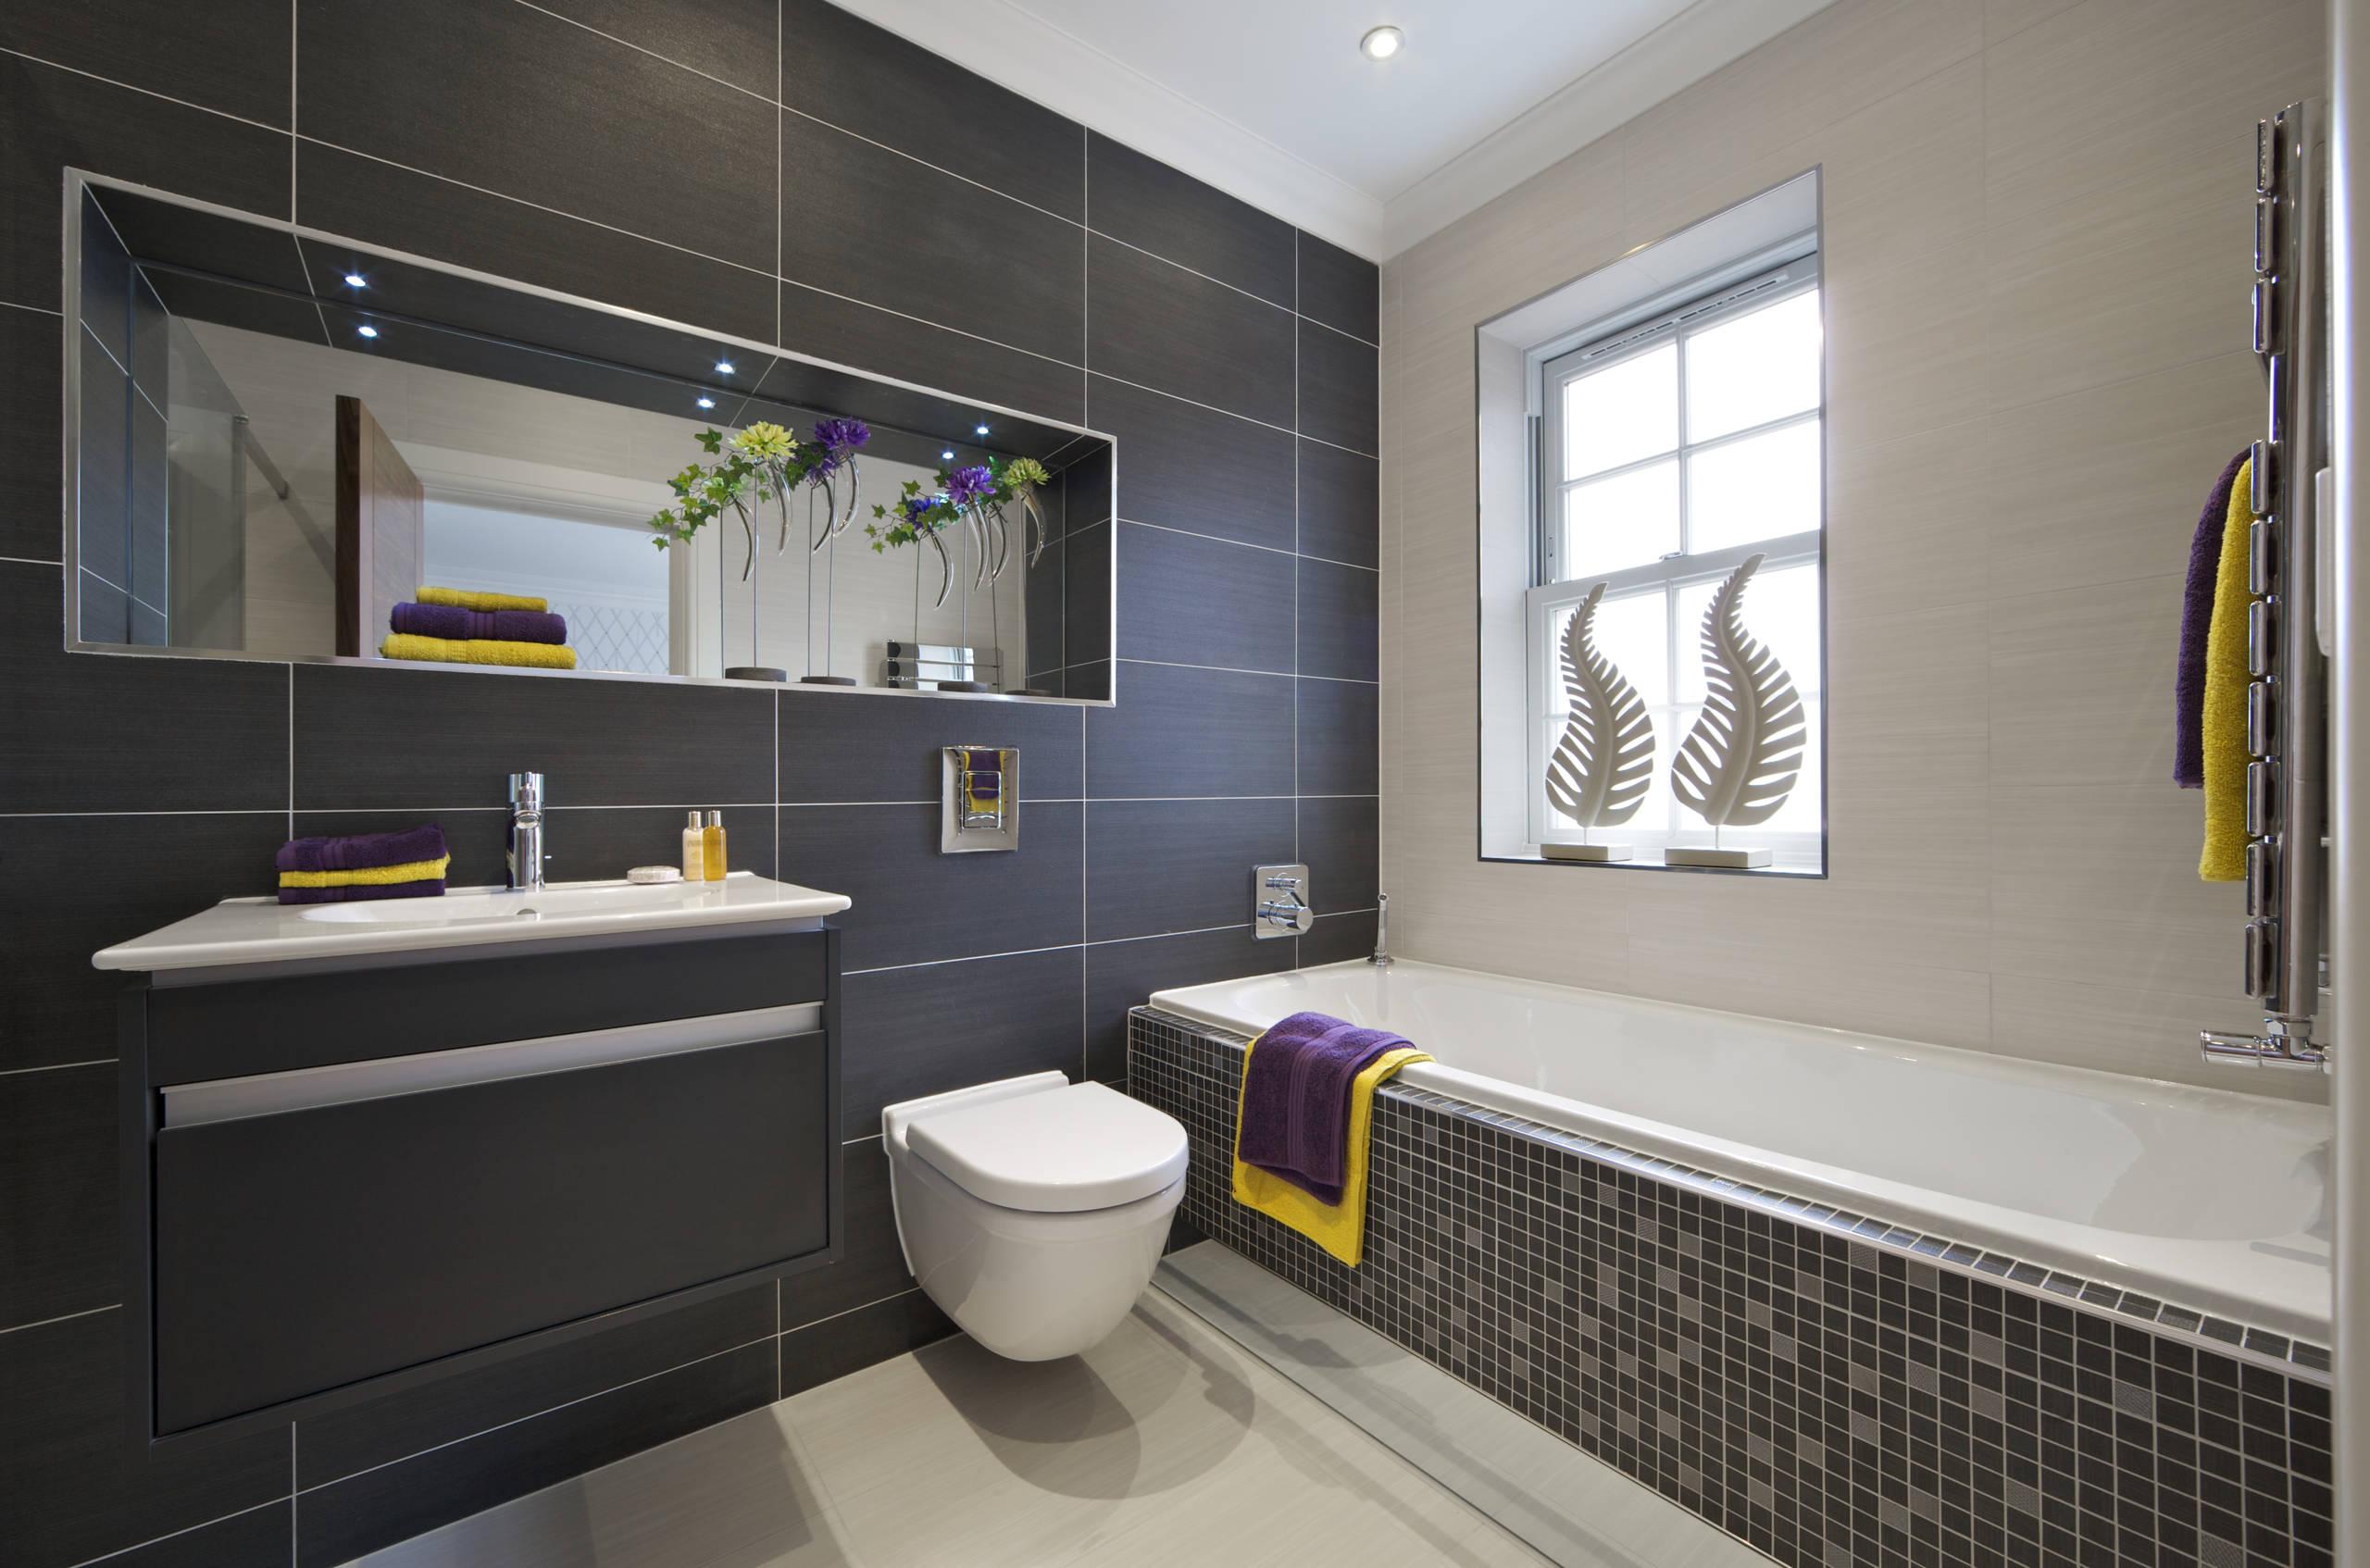 Luxury Bathroom Contrast - contrast tile